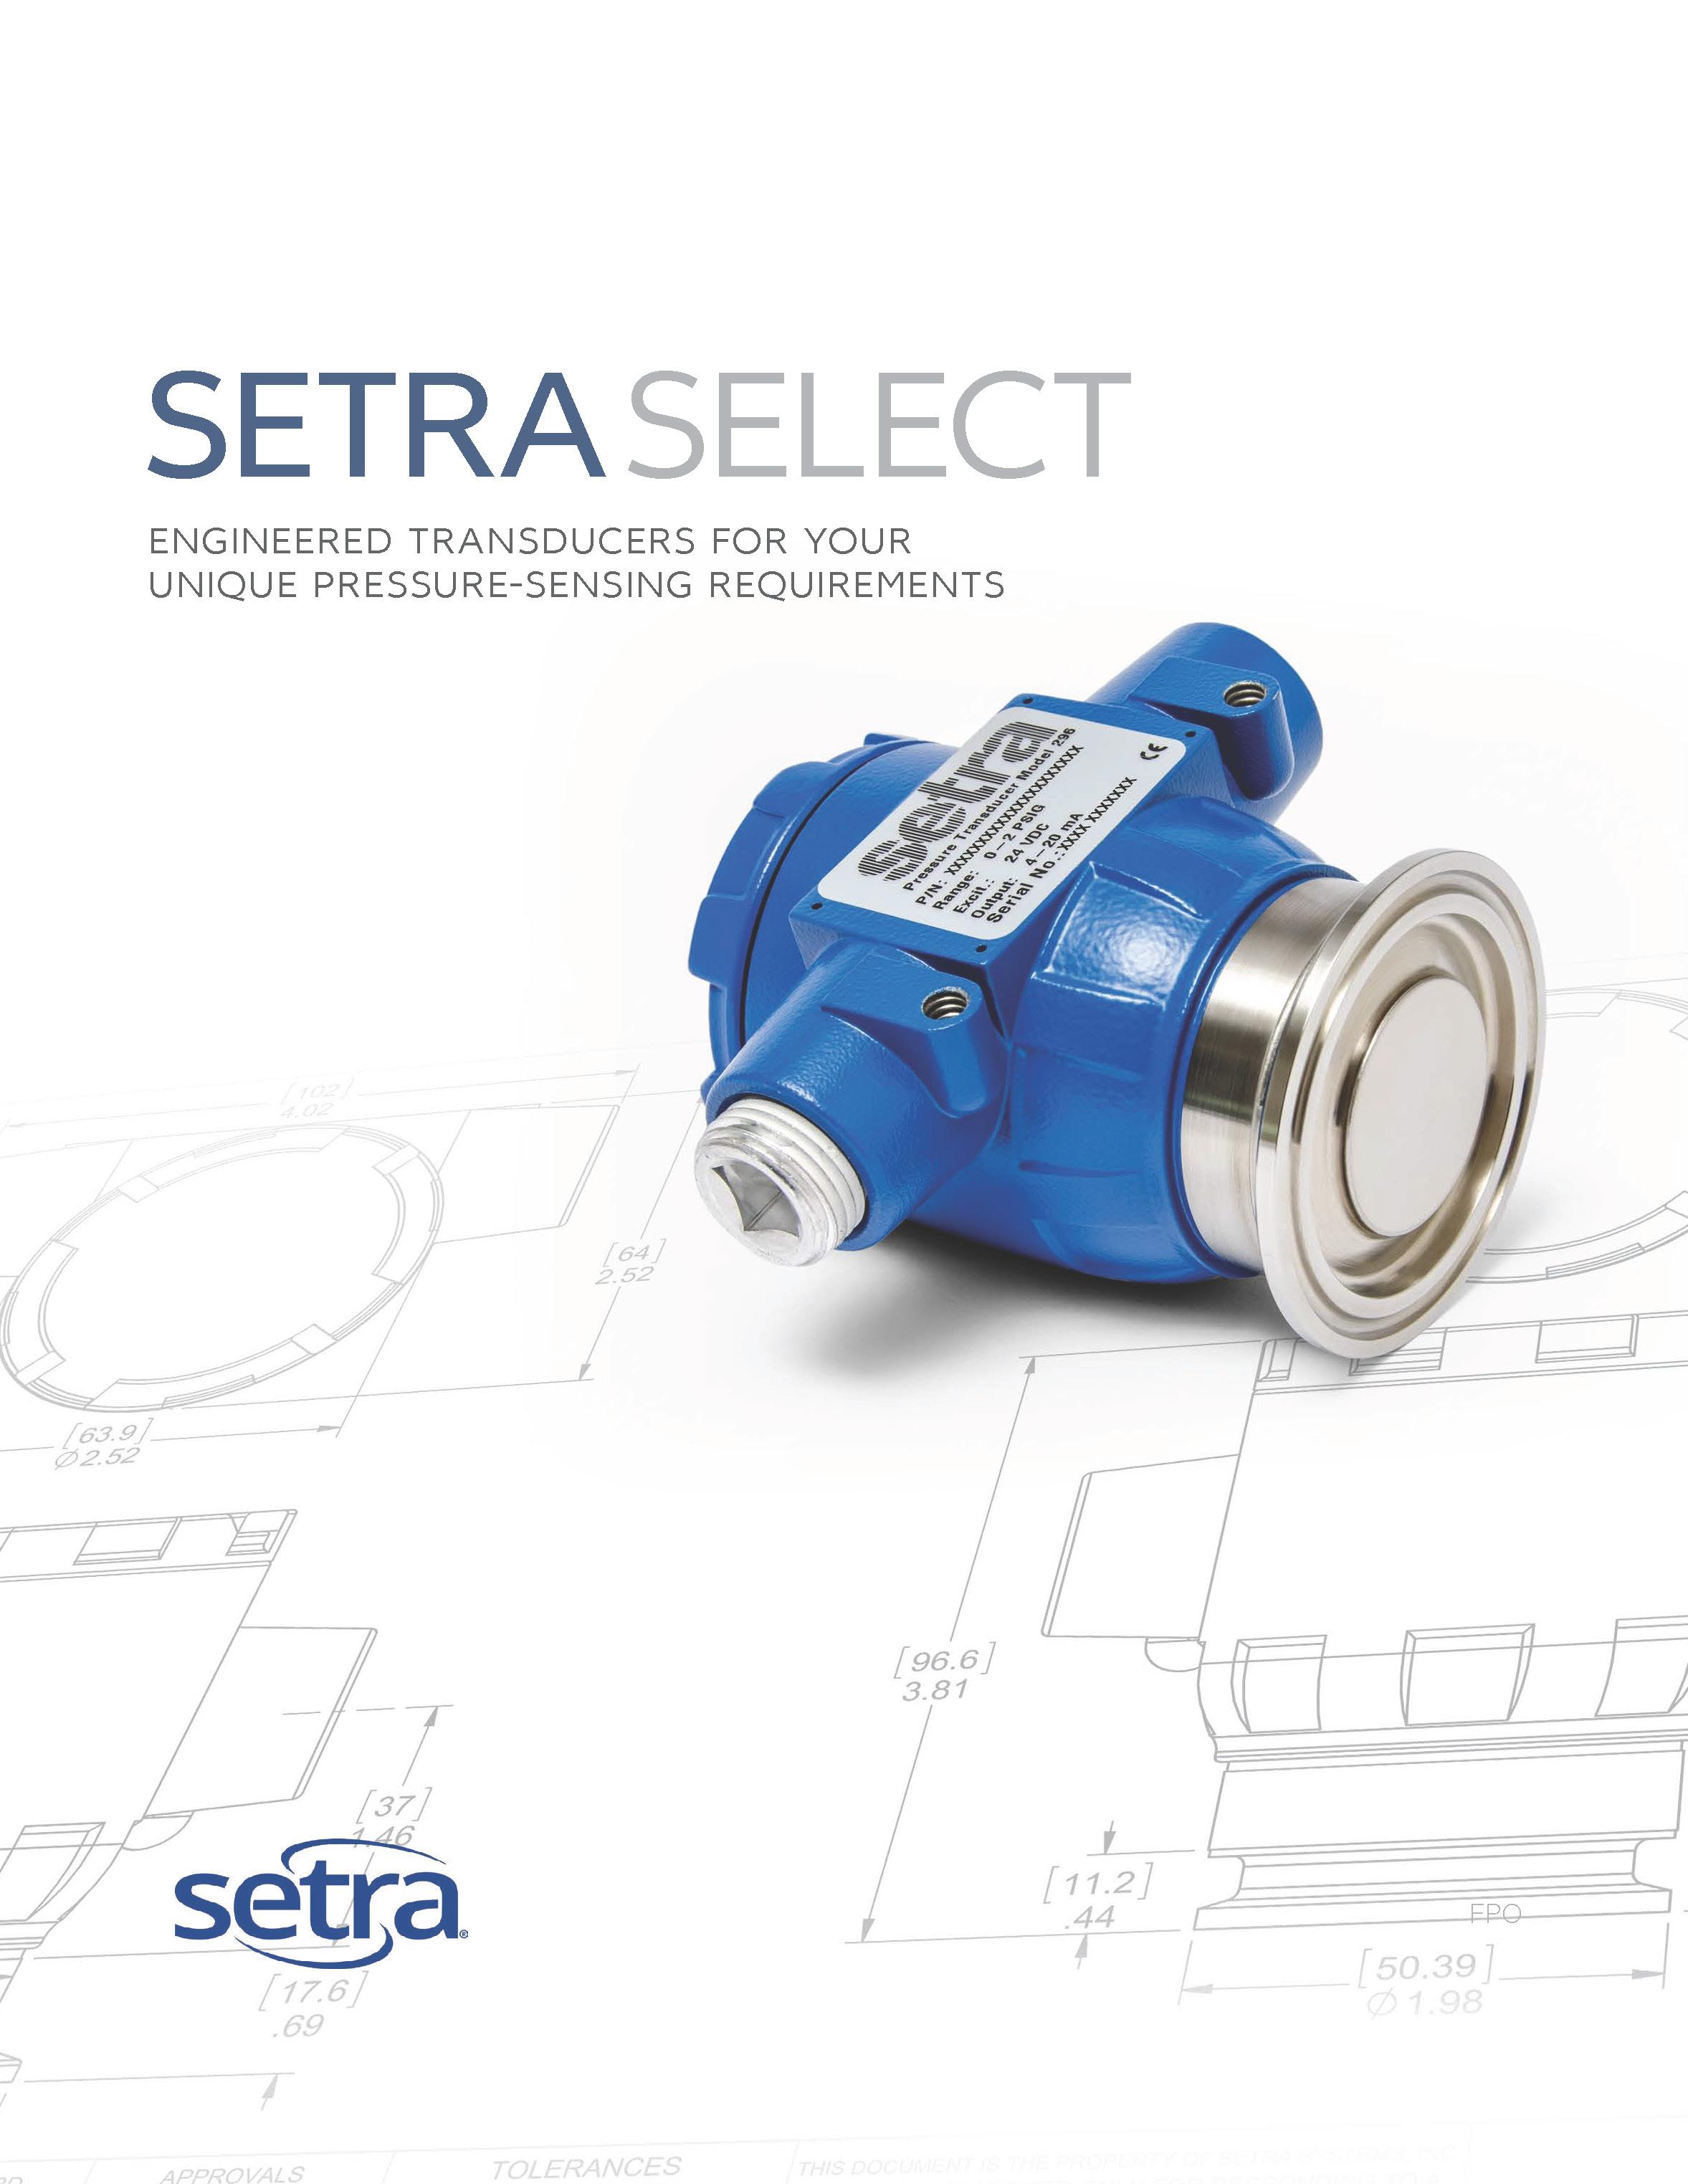 Customized Pressure Transducers- Setra Select